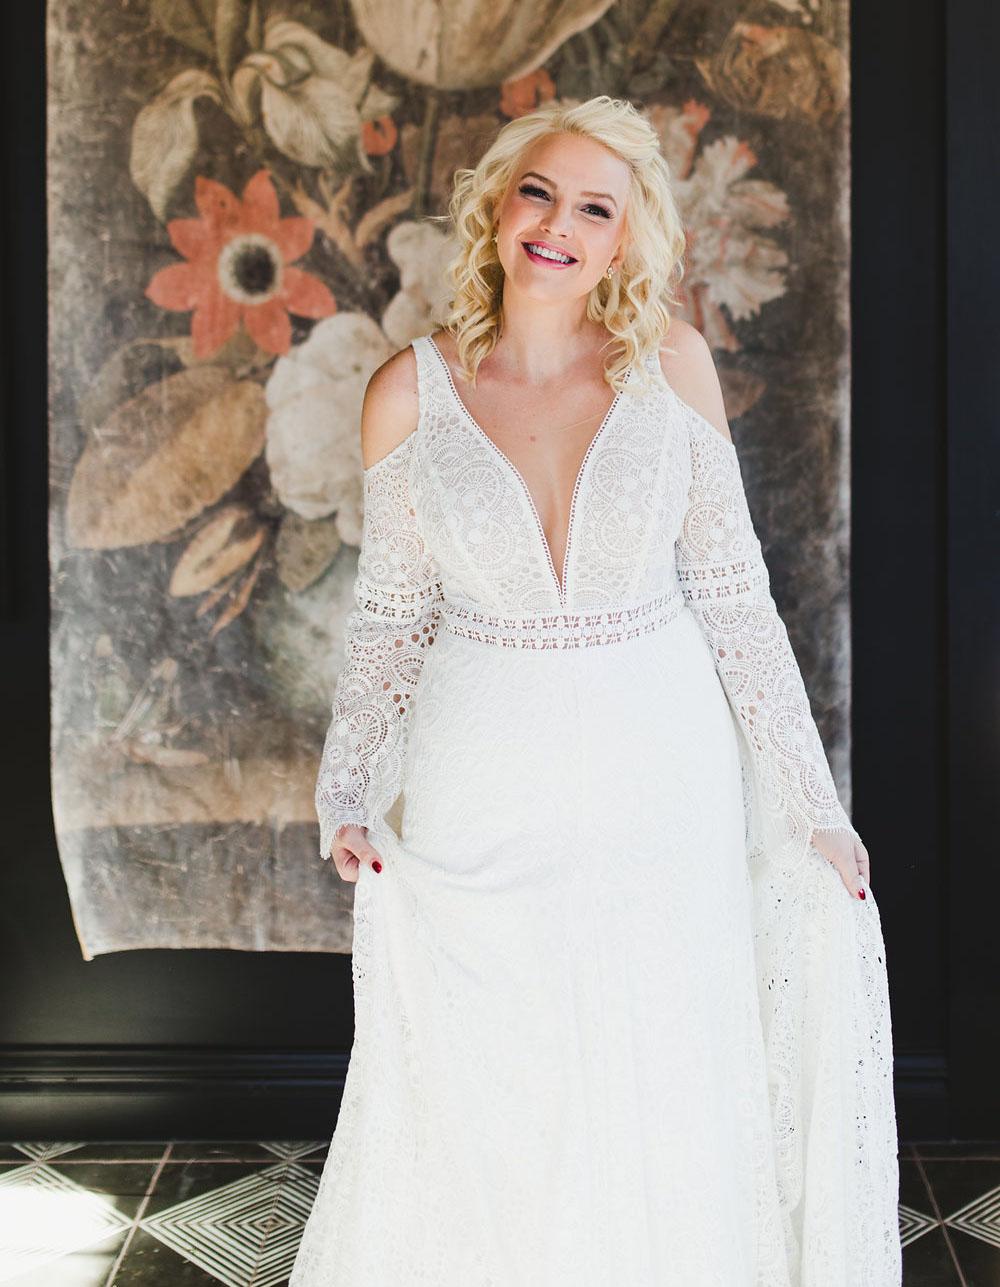 11 Foto Anna Boardman Photography - Vestidos de Noiva Boho plus size